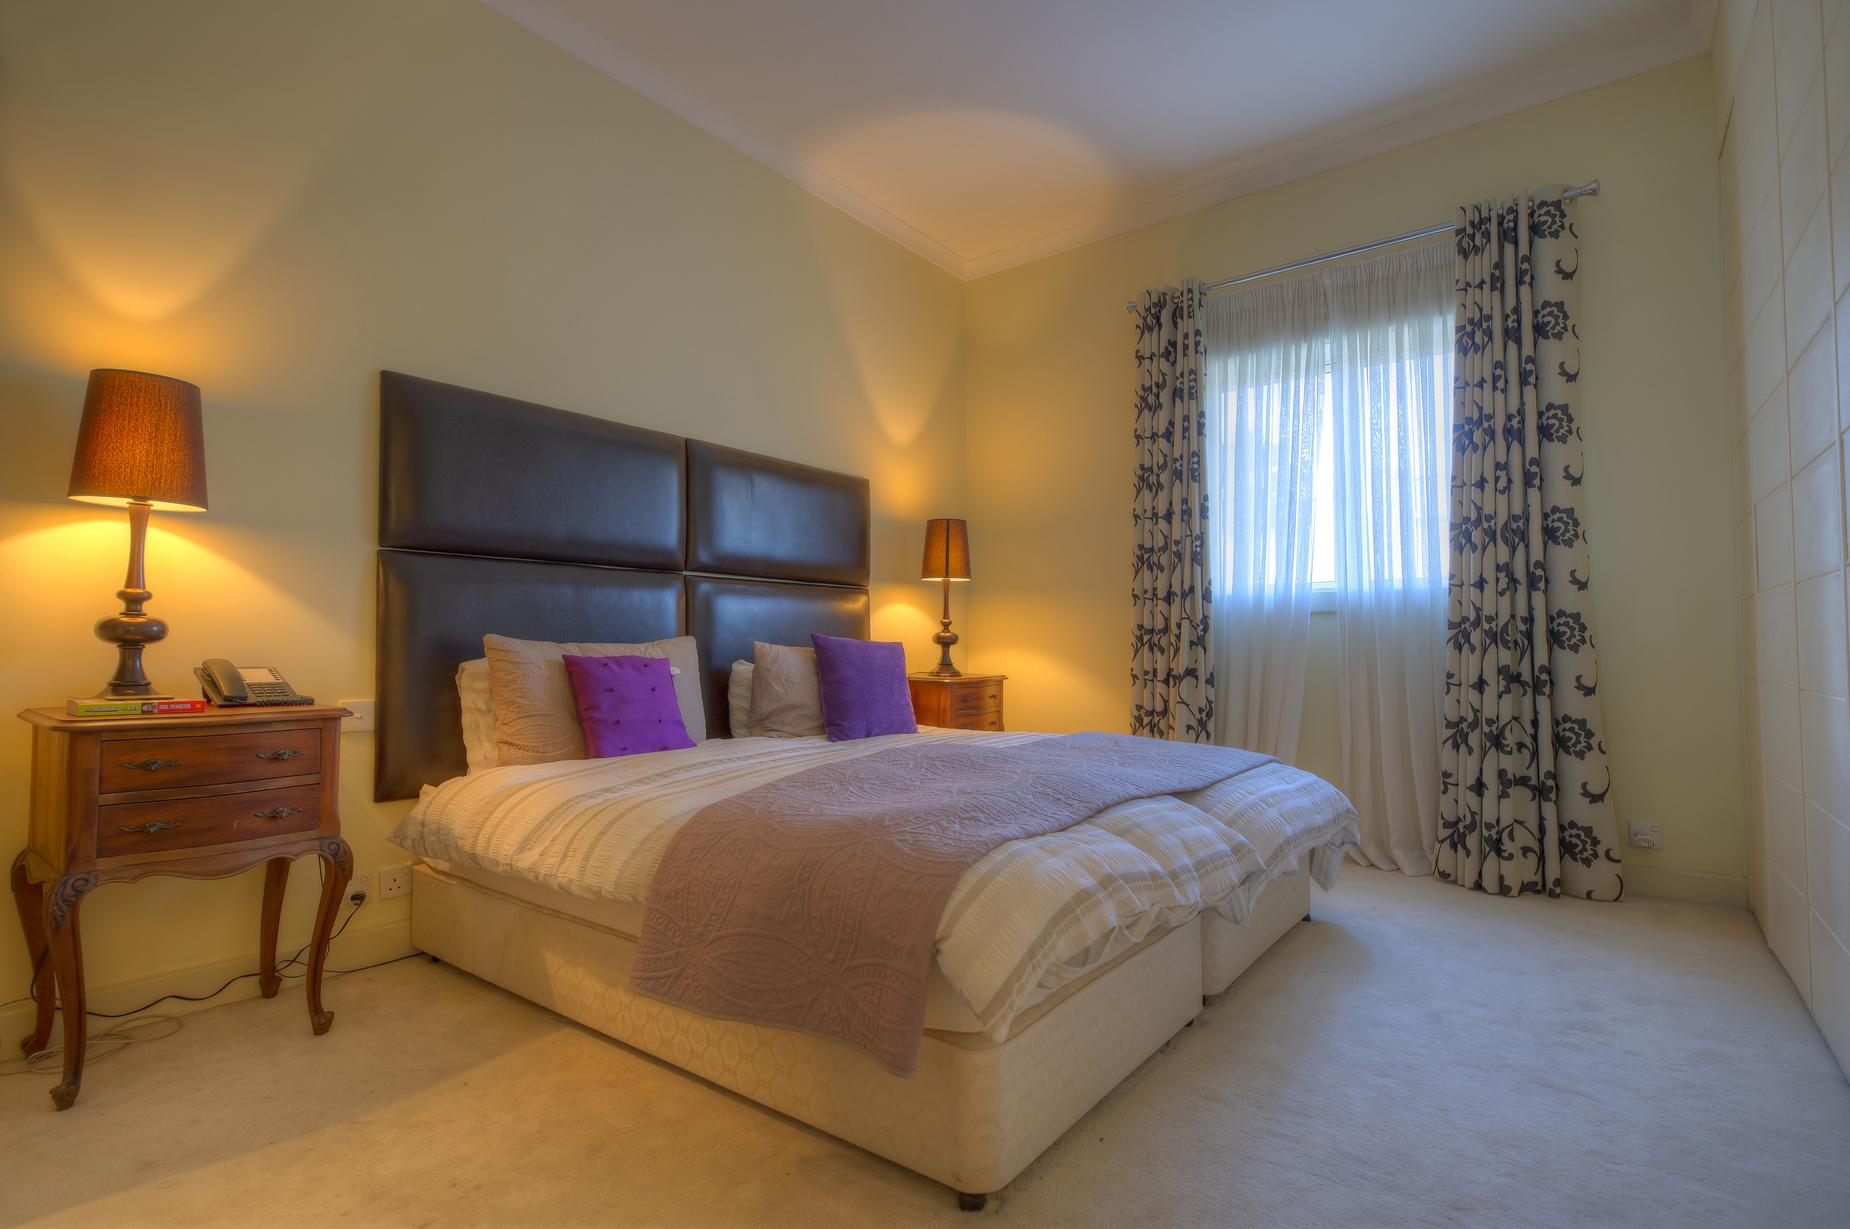 4 bed Villa For Rent in Iklin, Iklin - thumb 8